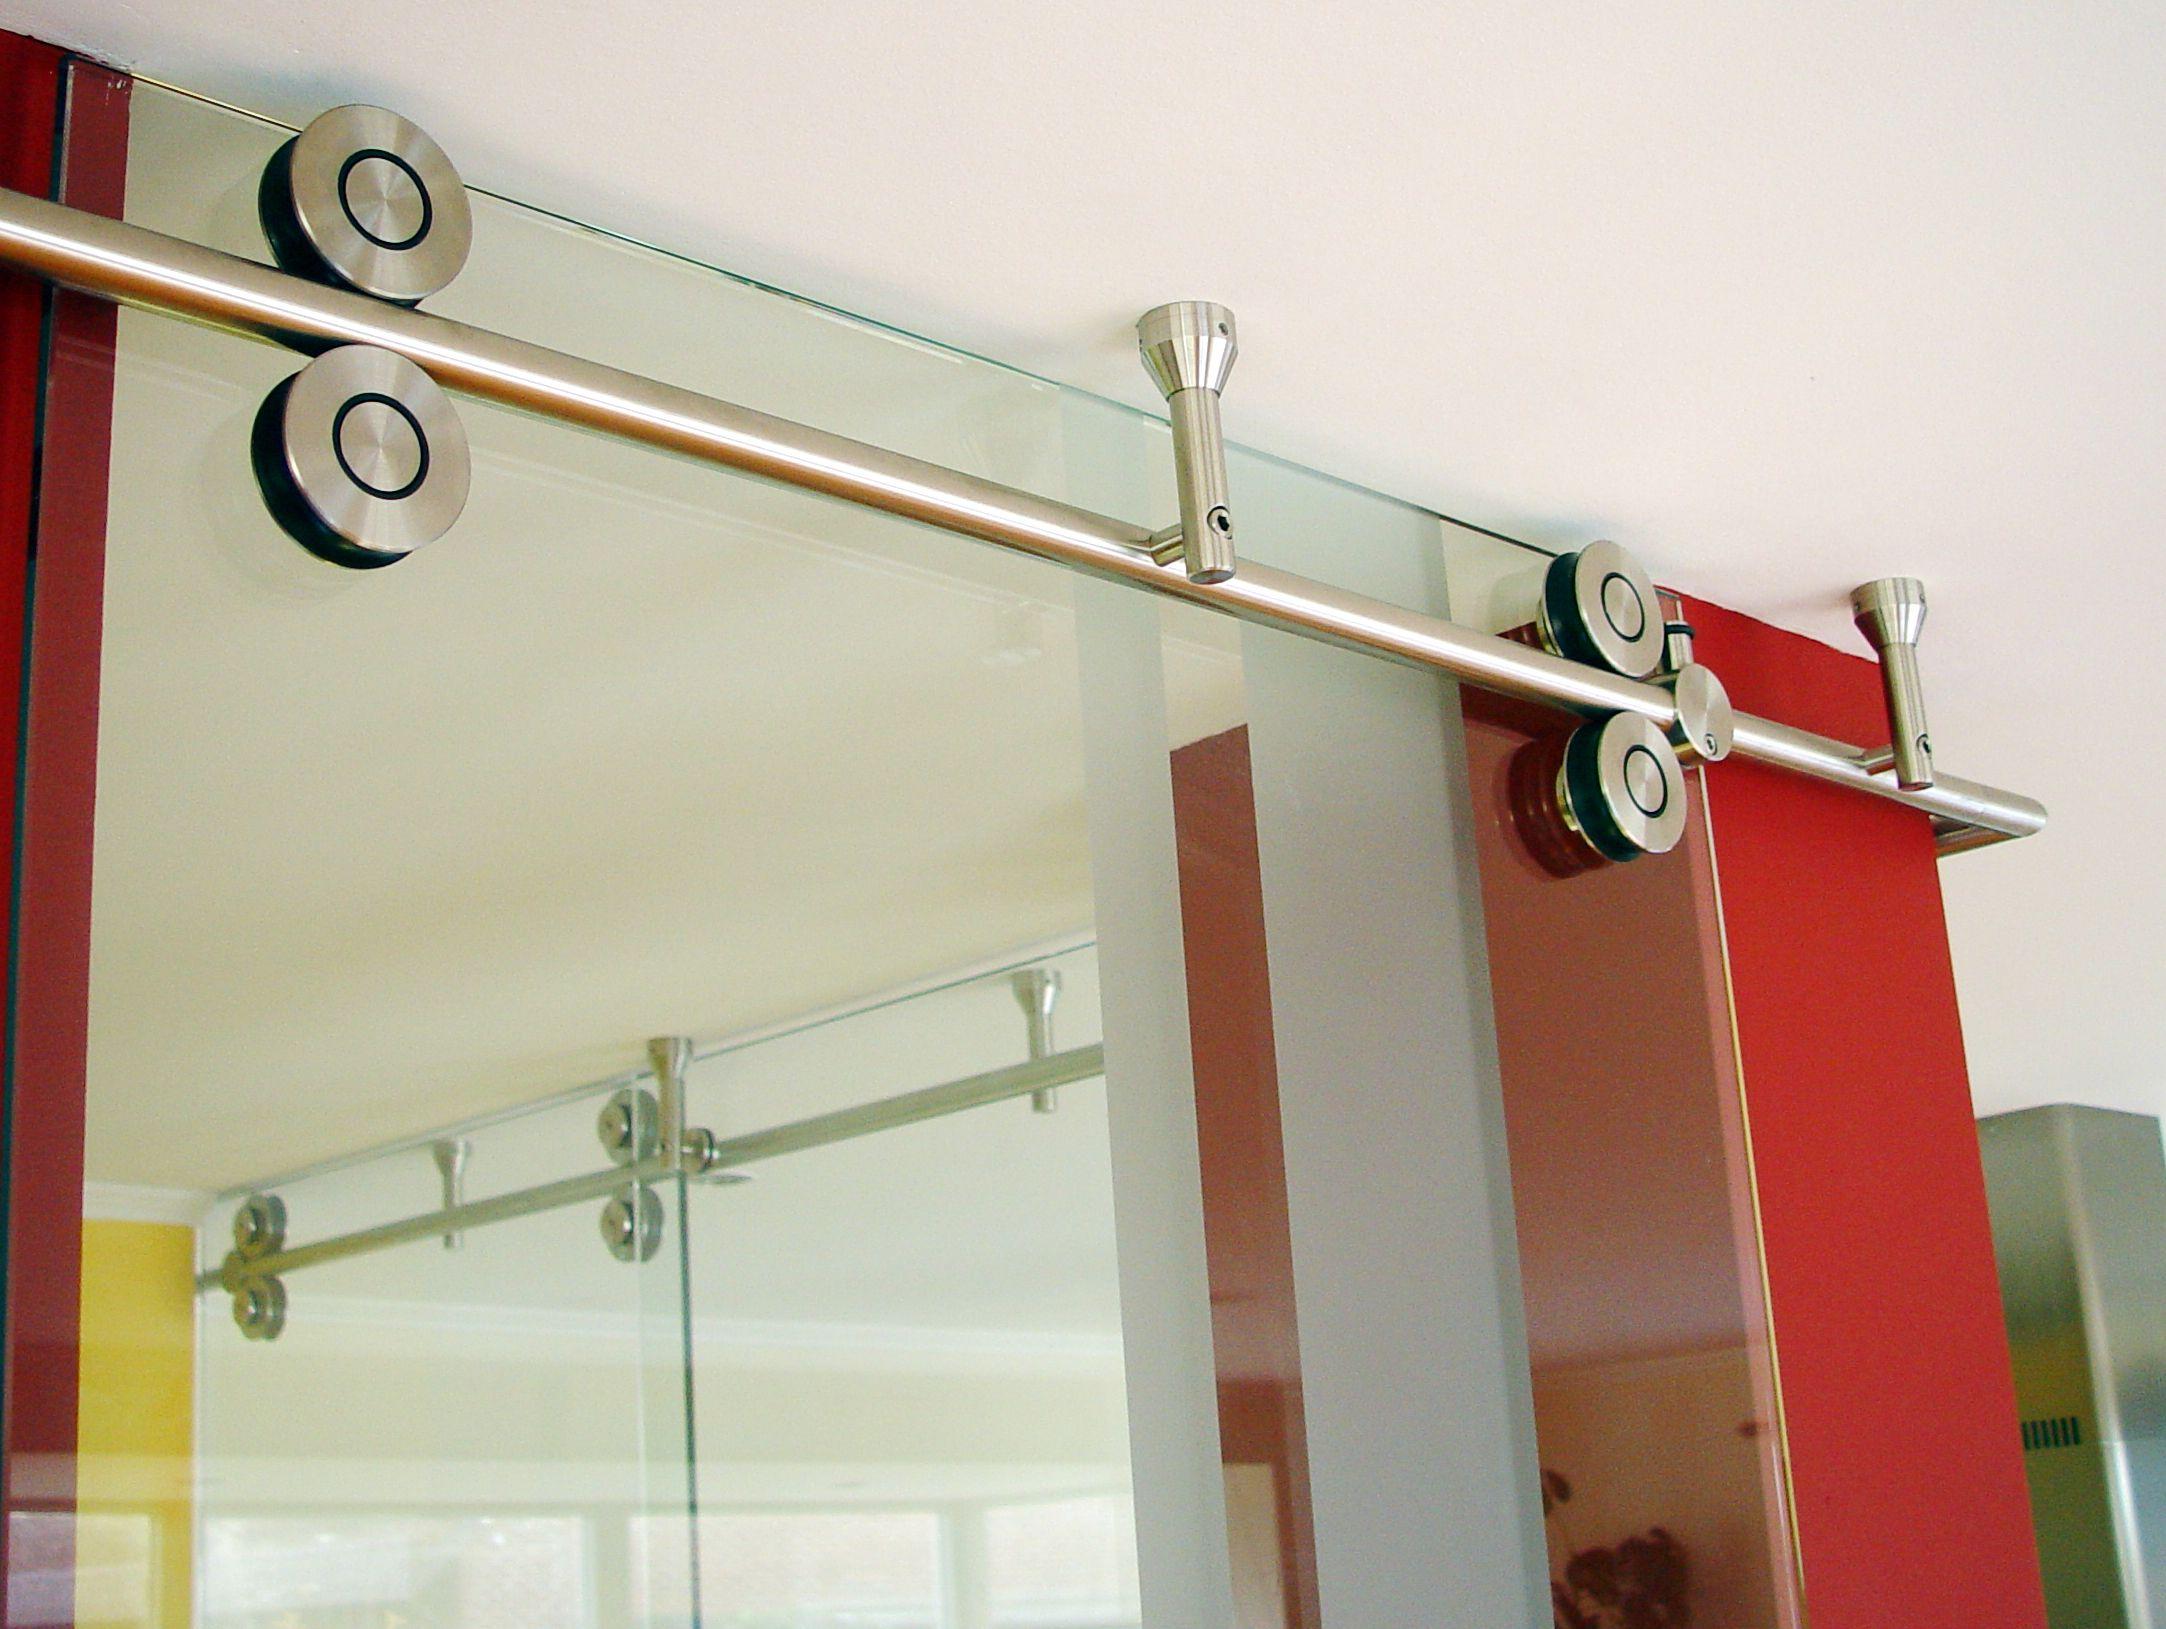 Mwe Twin Modern Barn Door Hardware Is Suitable For Single Or Double Bi Parting Applications The Rail Modern Barn Door Modern Door Hardware Making Barn Doors